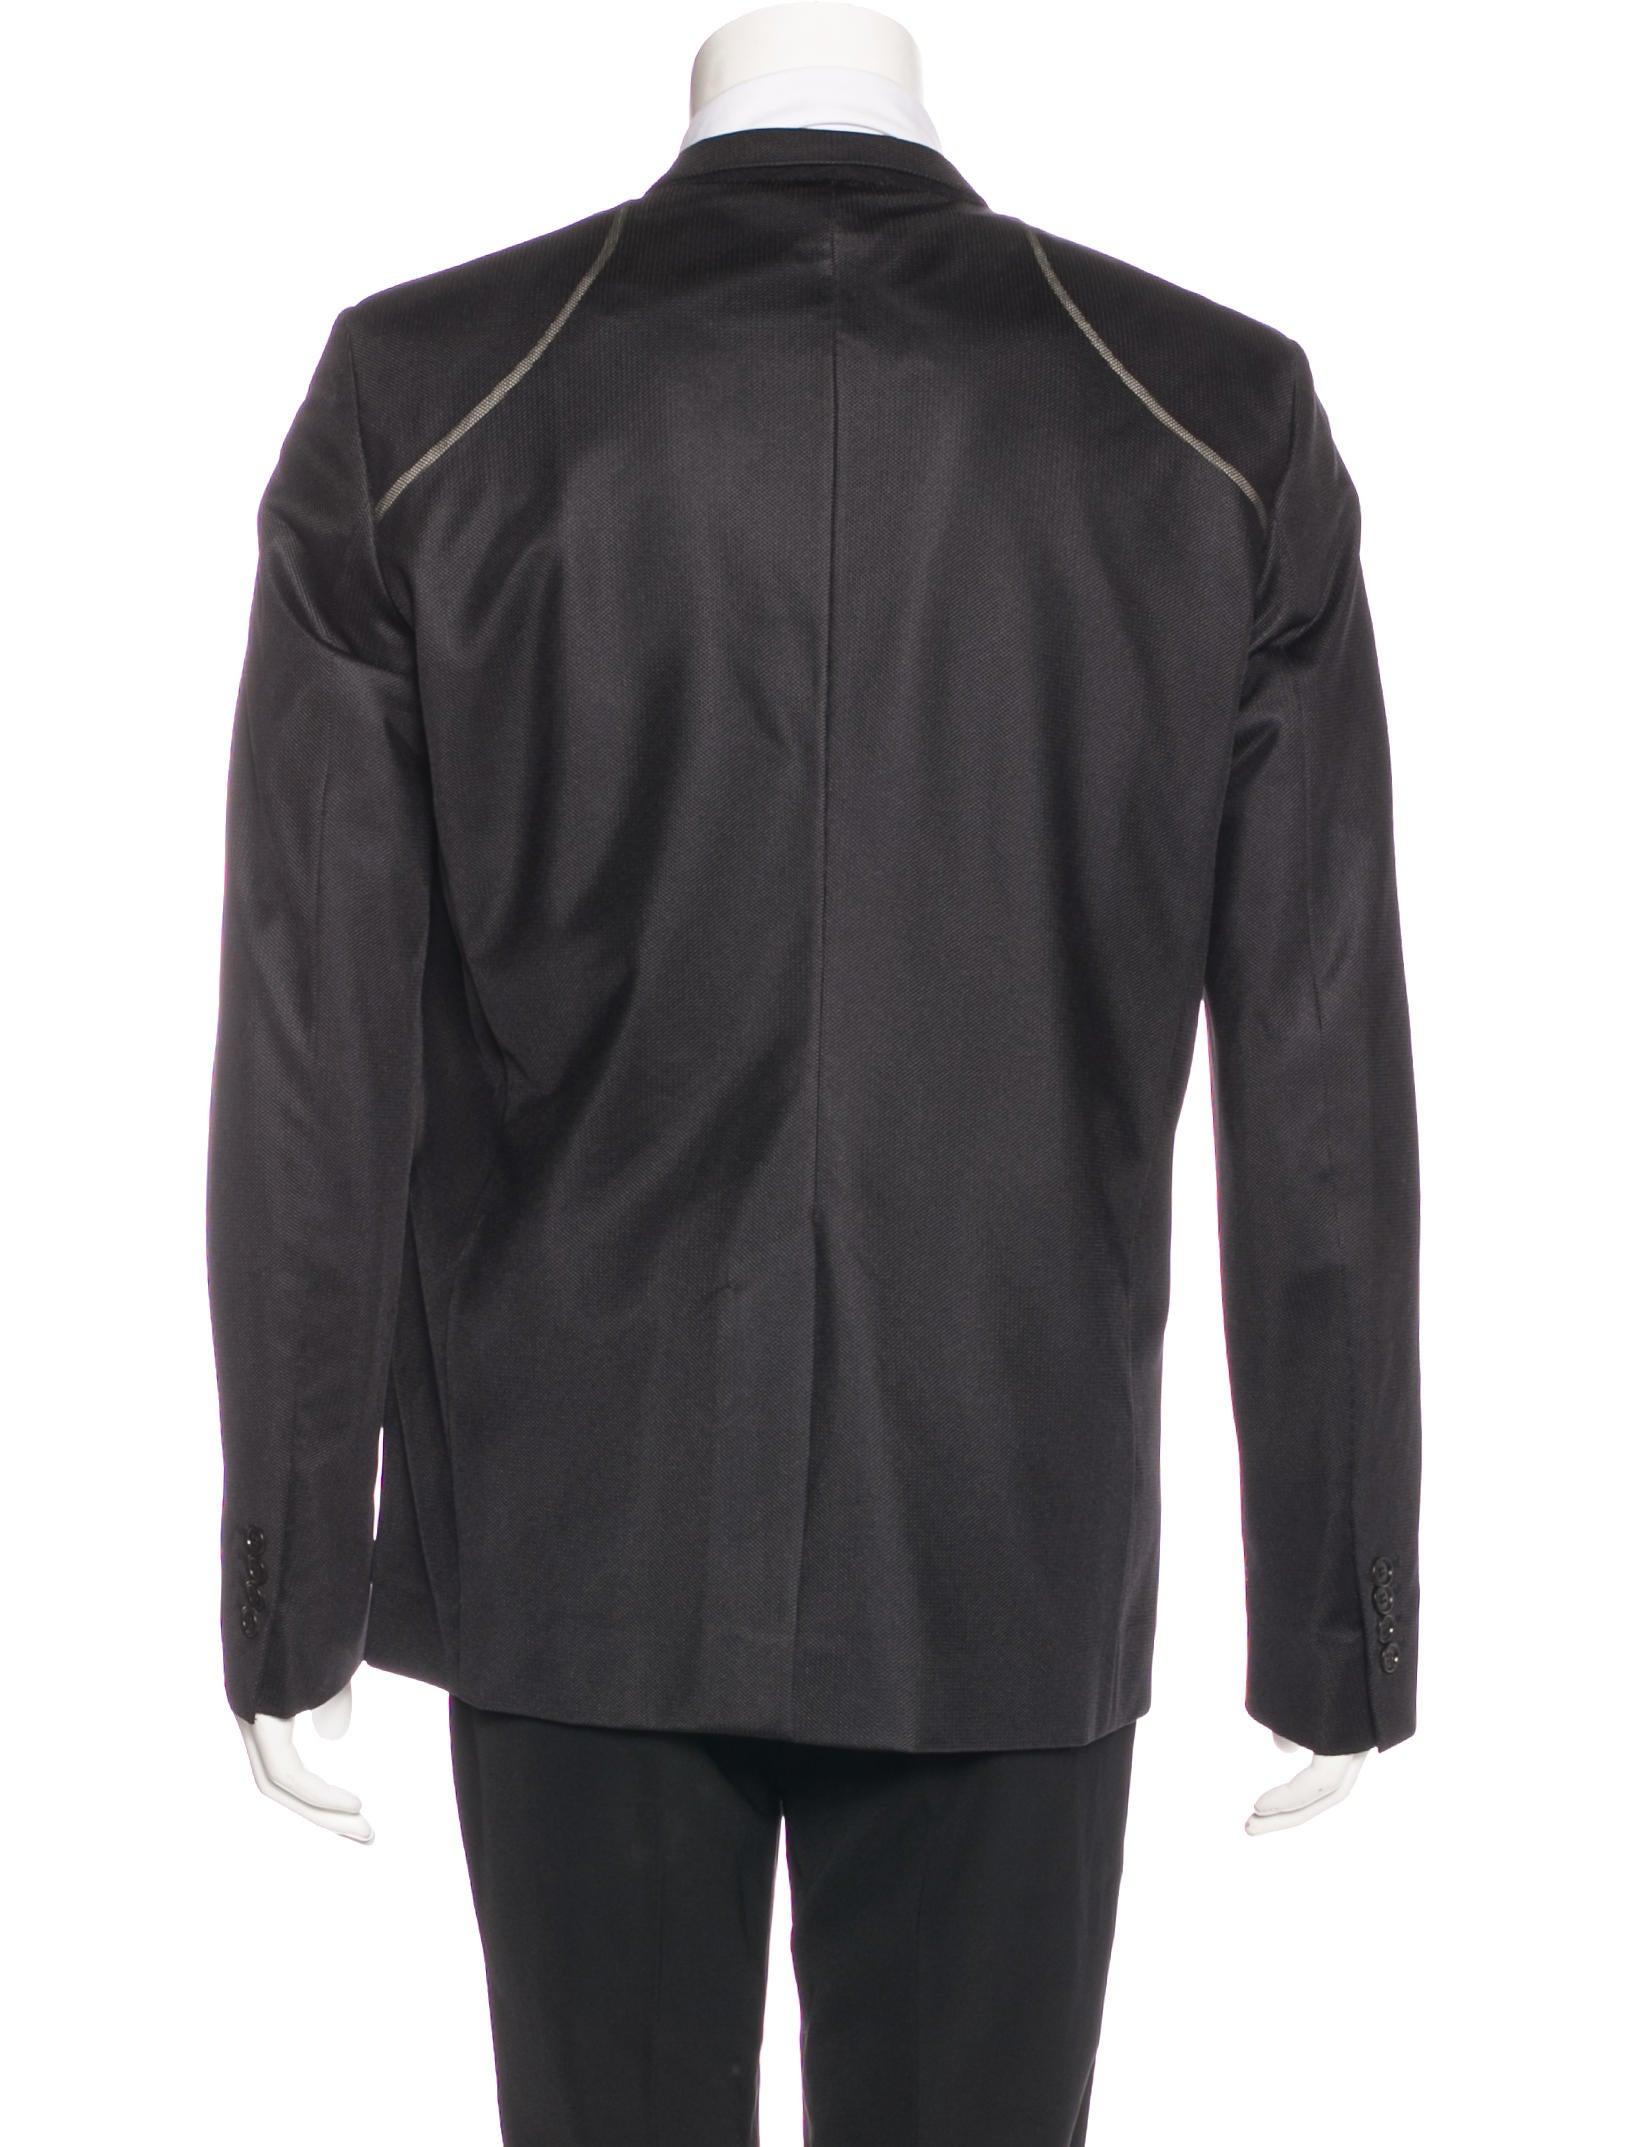 dior homme mesh tuxedo blazer clothing hmm23722 the. Black Bedroom Furniture Sets. Home Design Ideas